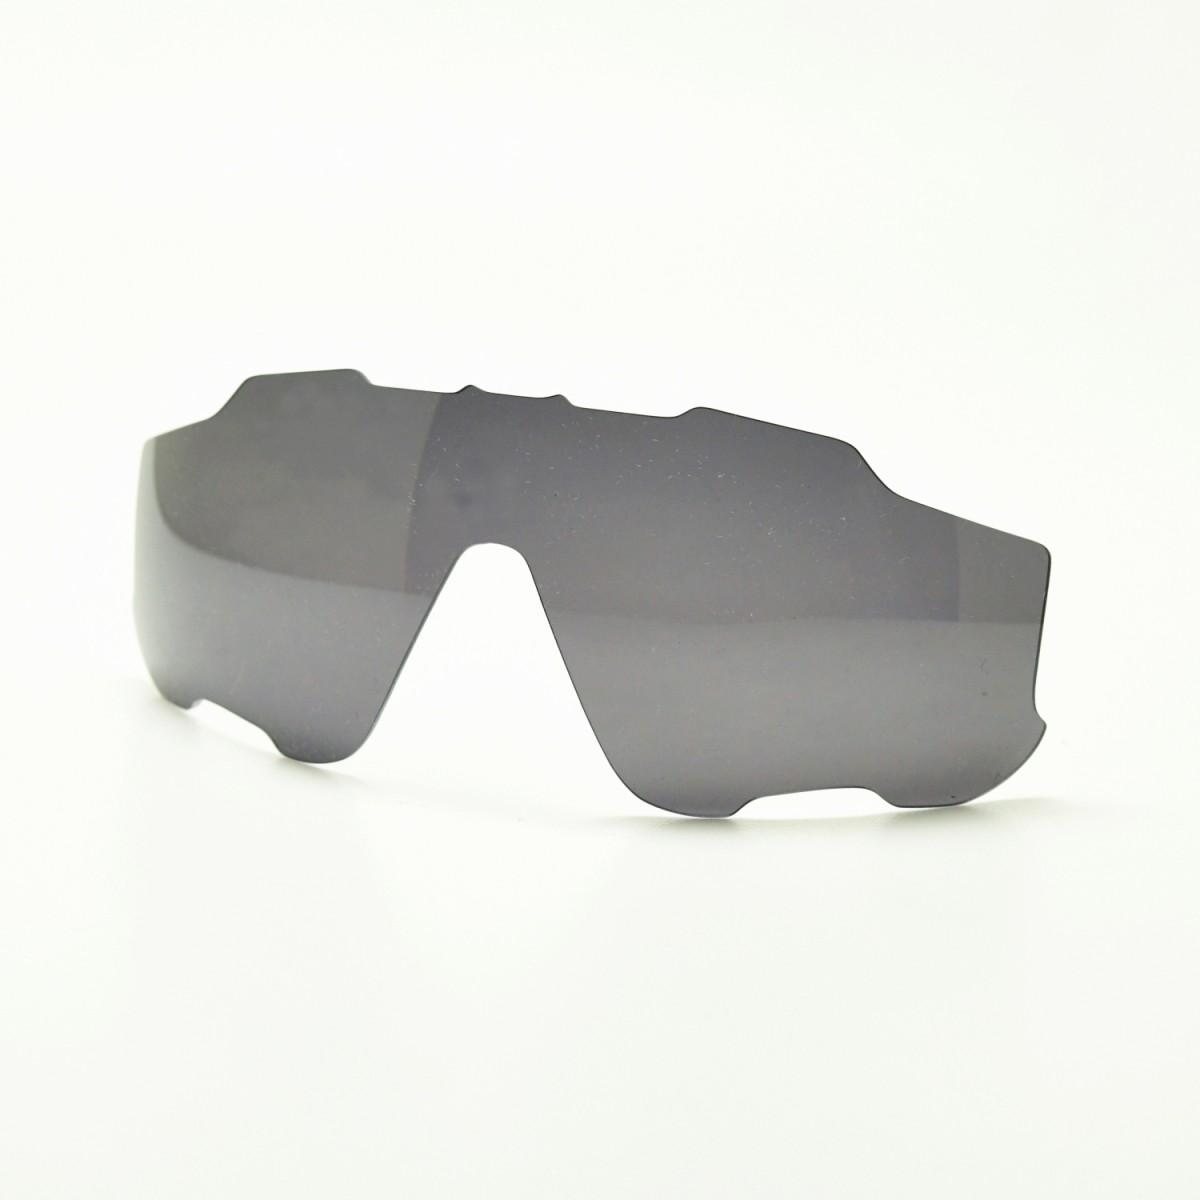 GOODMAN LENS MANUFACTURE グッドマンレンズマニュファクチューOAKLEY JAWBREAKER オークリー ジョーブレーカー用交換レンズ偏光グレー ※レンズのみ